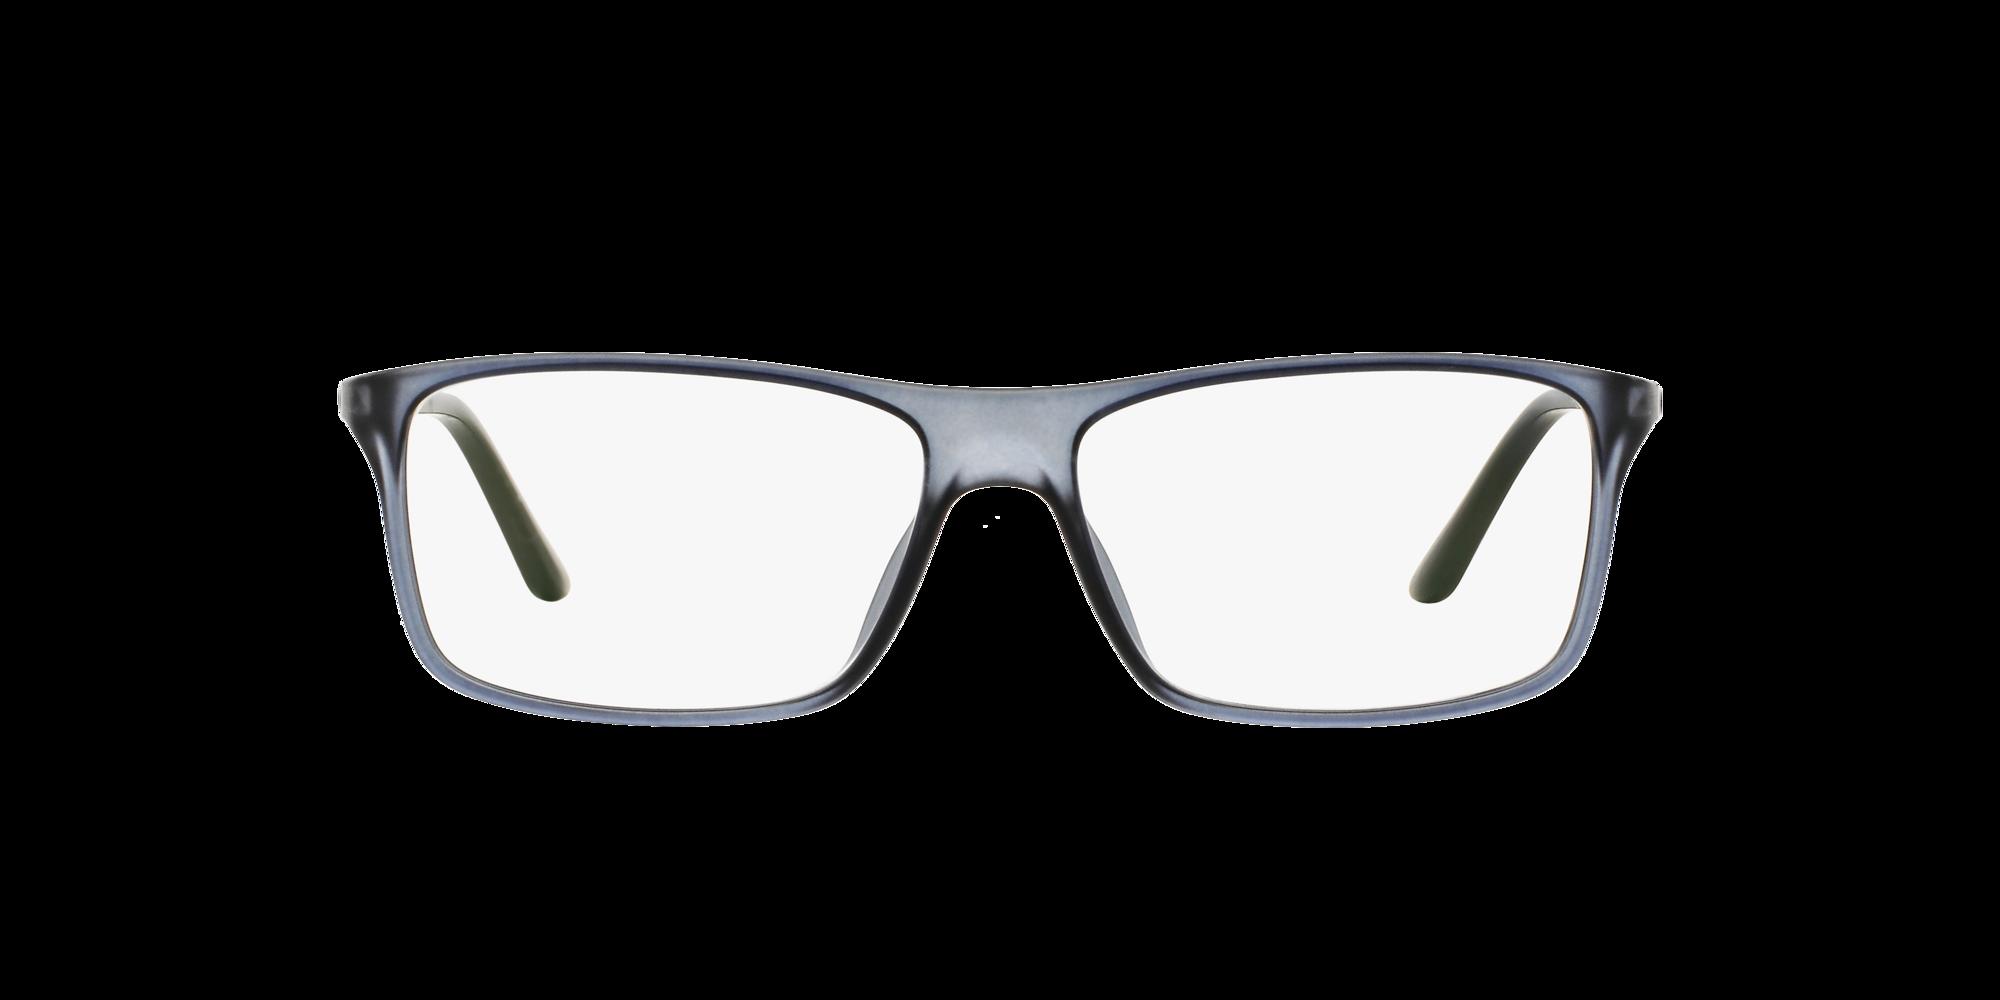 Image for SH1043X PL1043 from LensCrafters | Glasses, Prescription Glasses Online, Eyewear